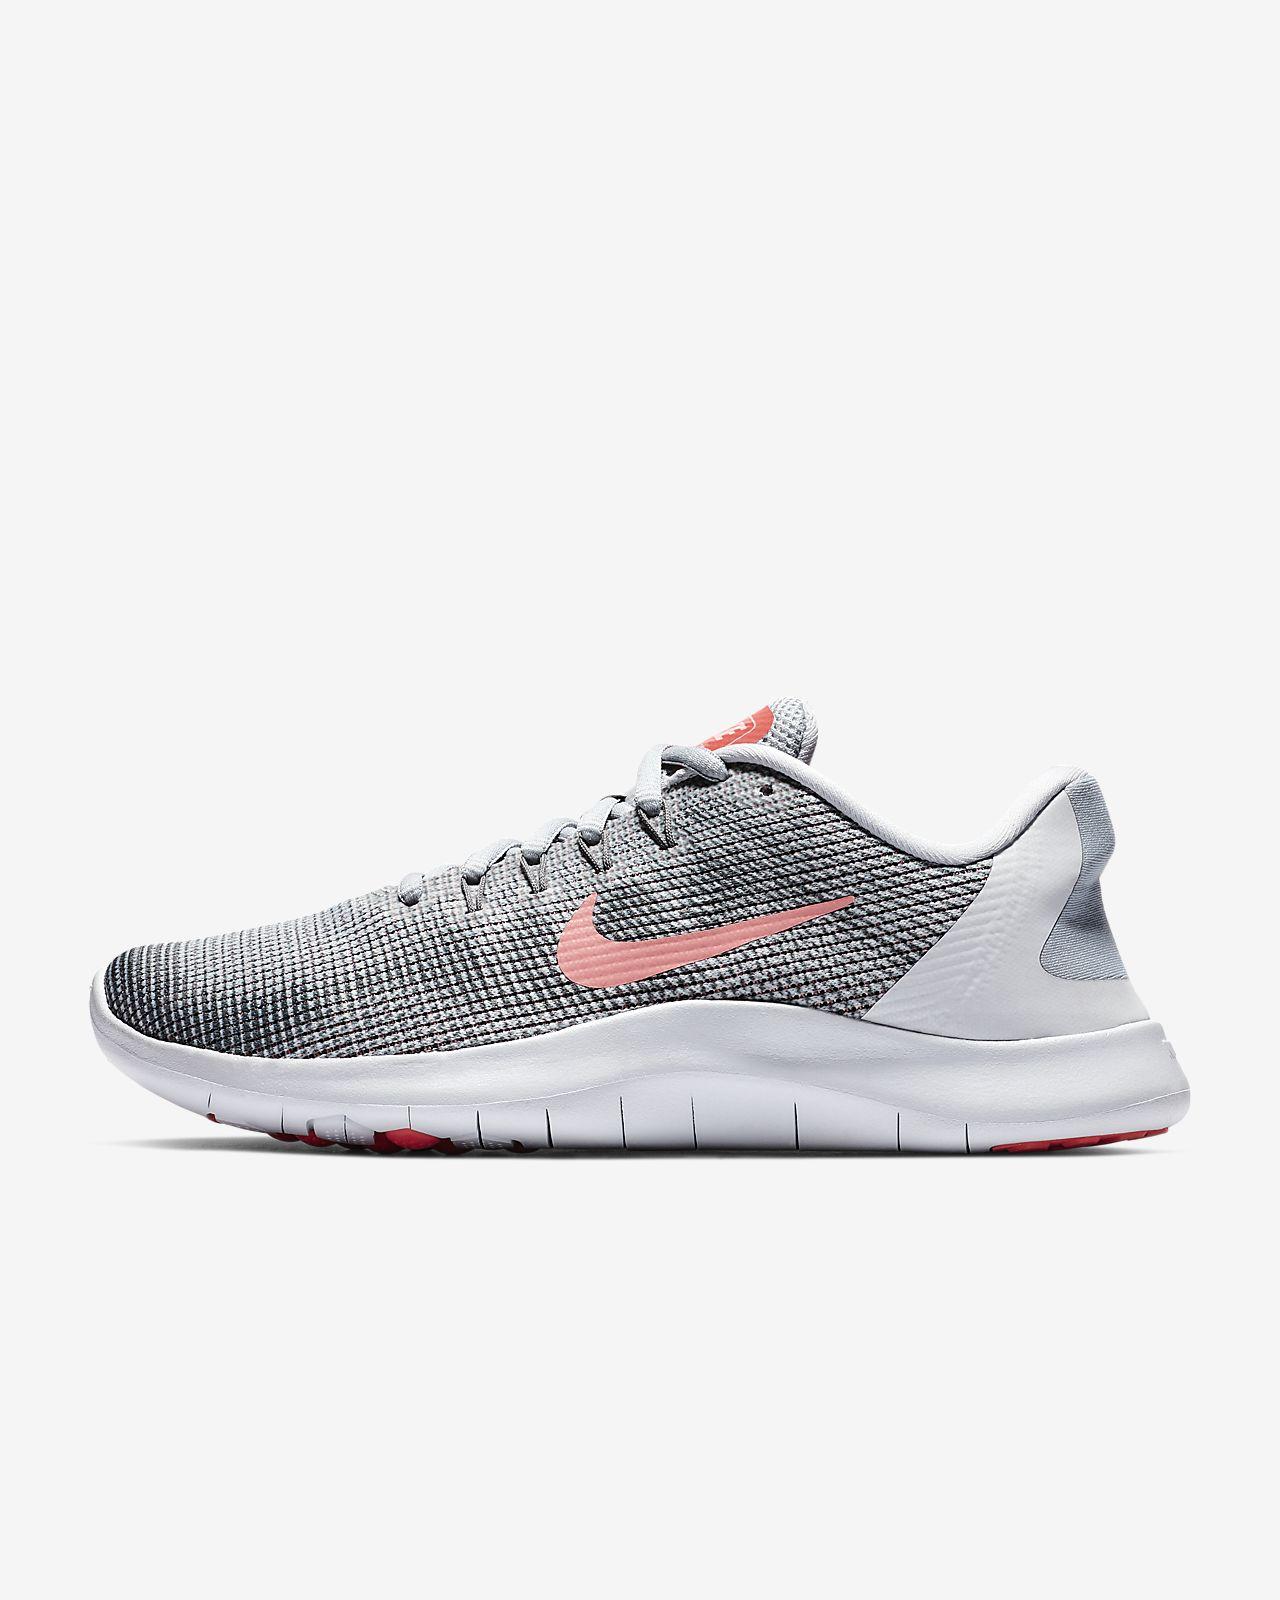 59addd9f4a Nike Flex RN 2018 Women's Running Shoe. Nike.com